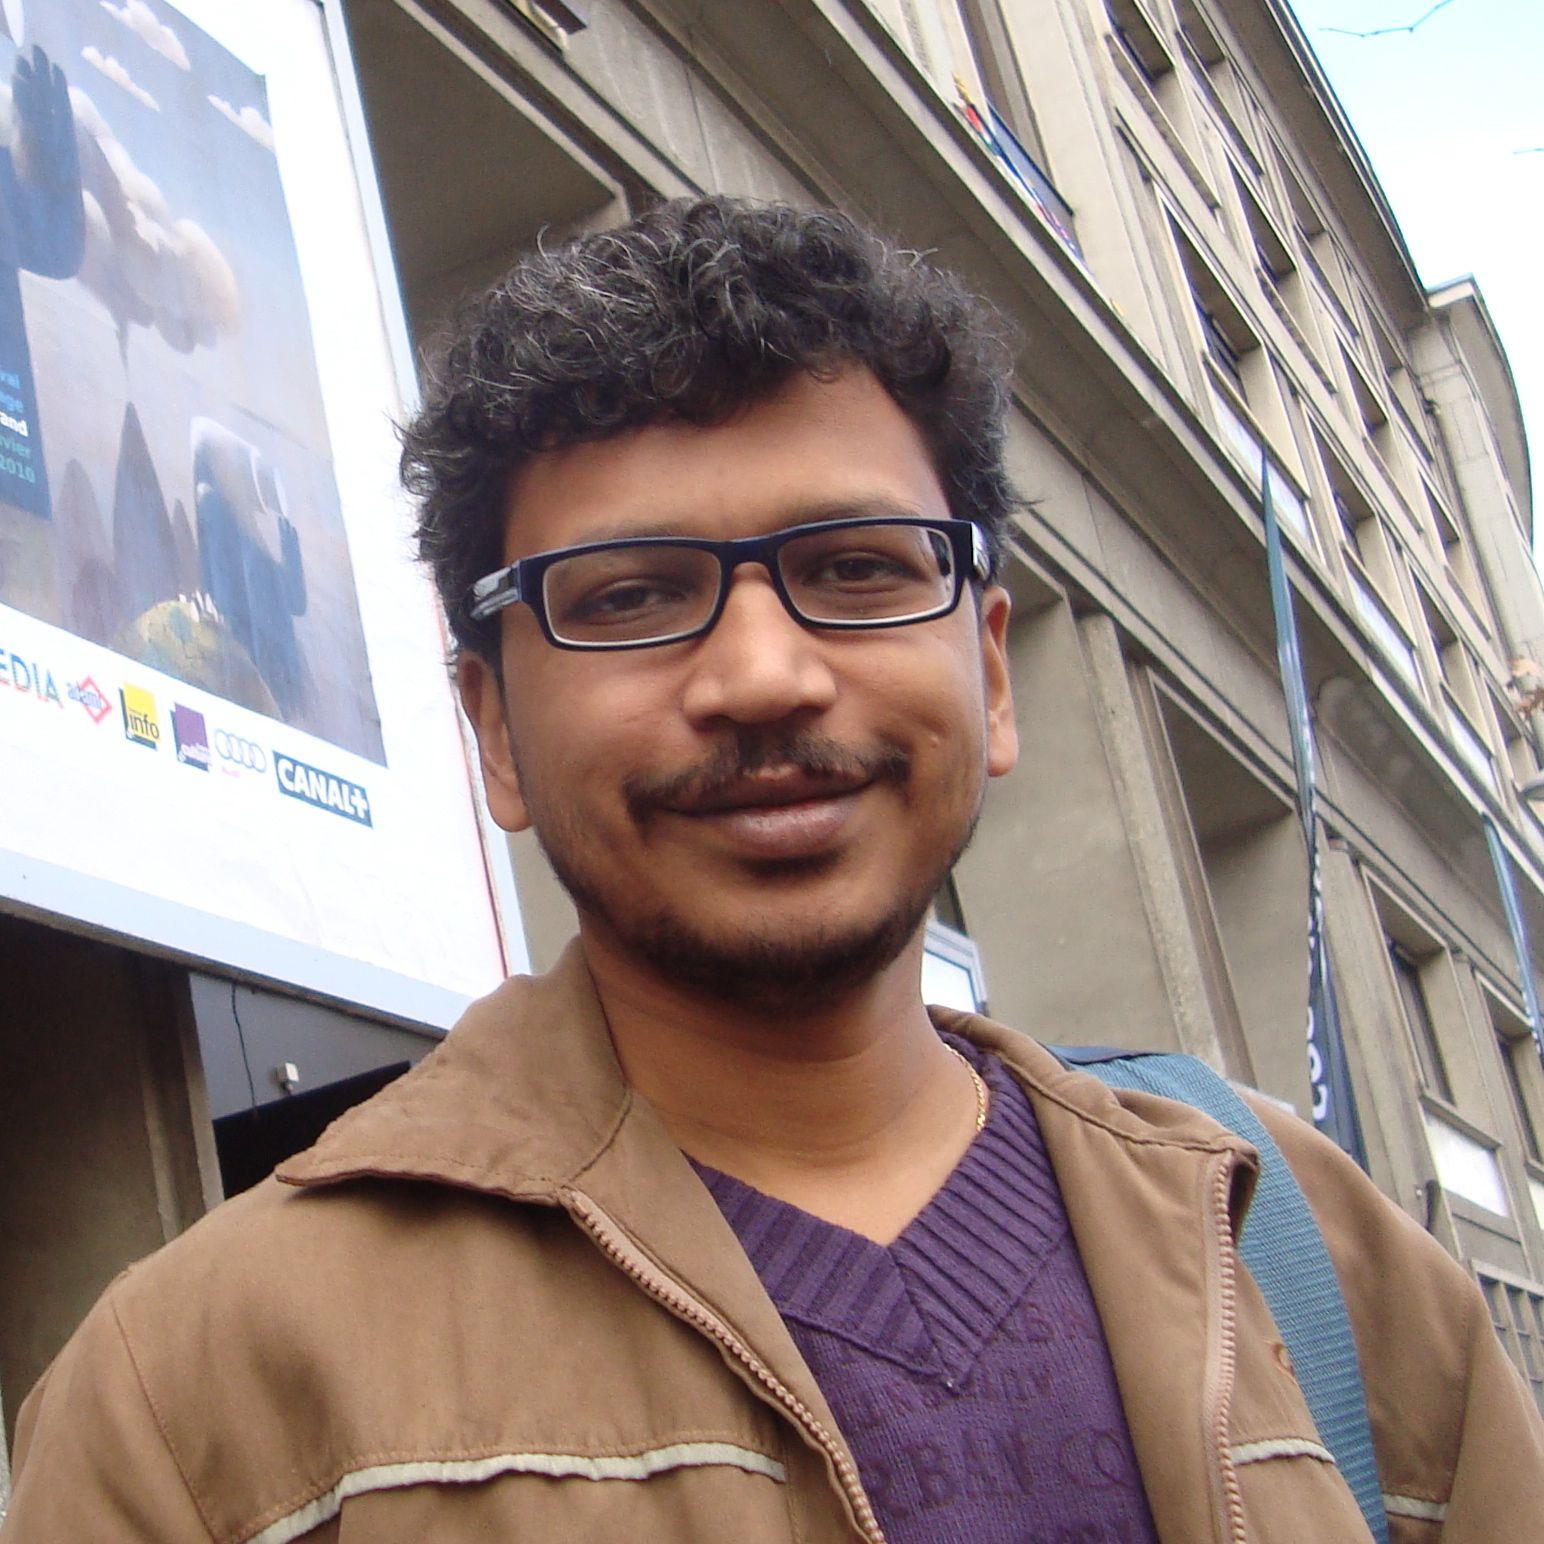 Umesh Kulkarni et l'exploration de genres et d'histoires pluriels